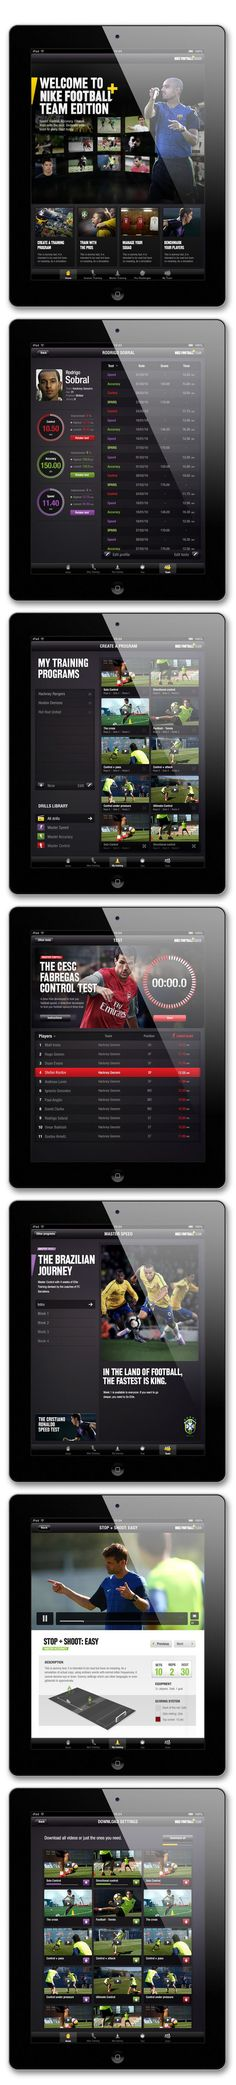 Nike Football + Team Edition / by Rodrigo Sobral